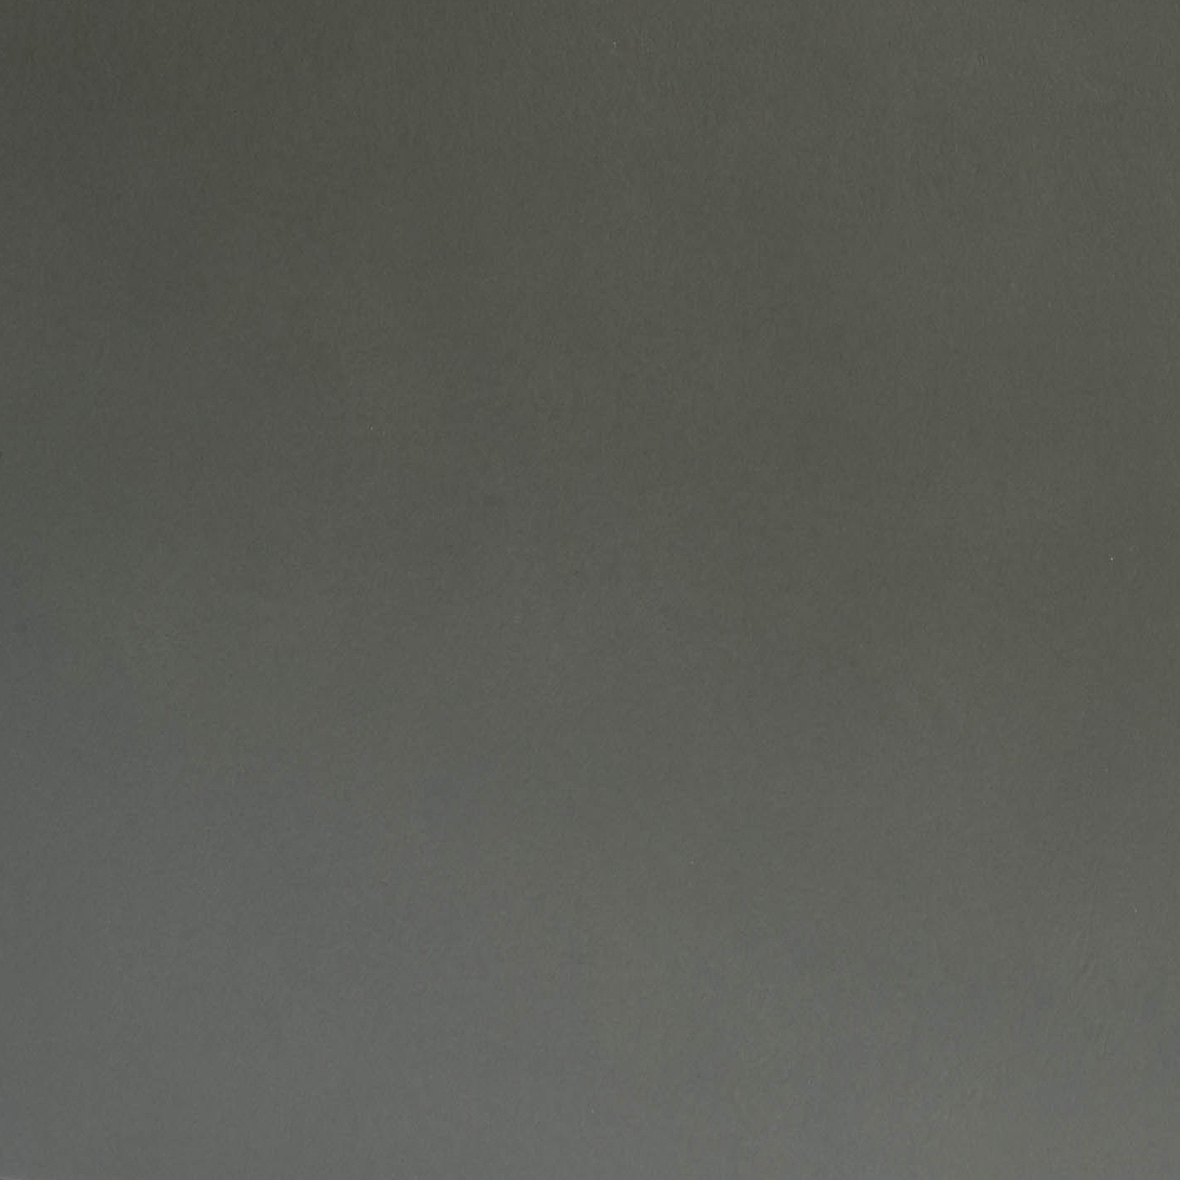 blumentopf sessanta 6 anthrazit